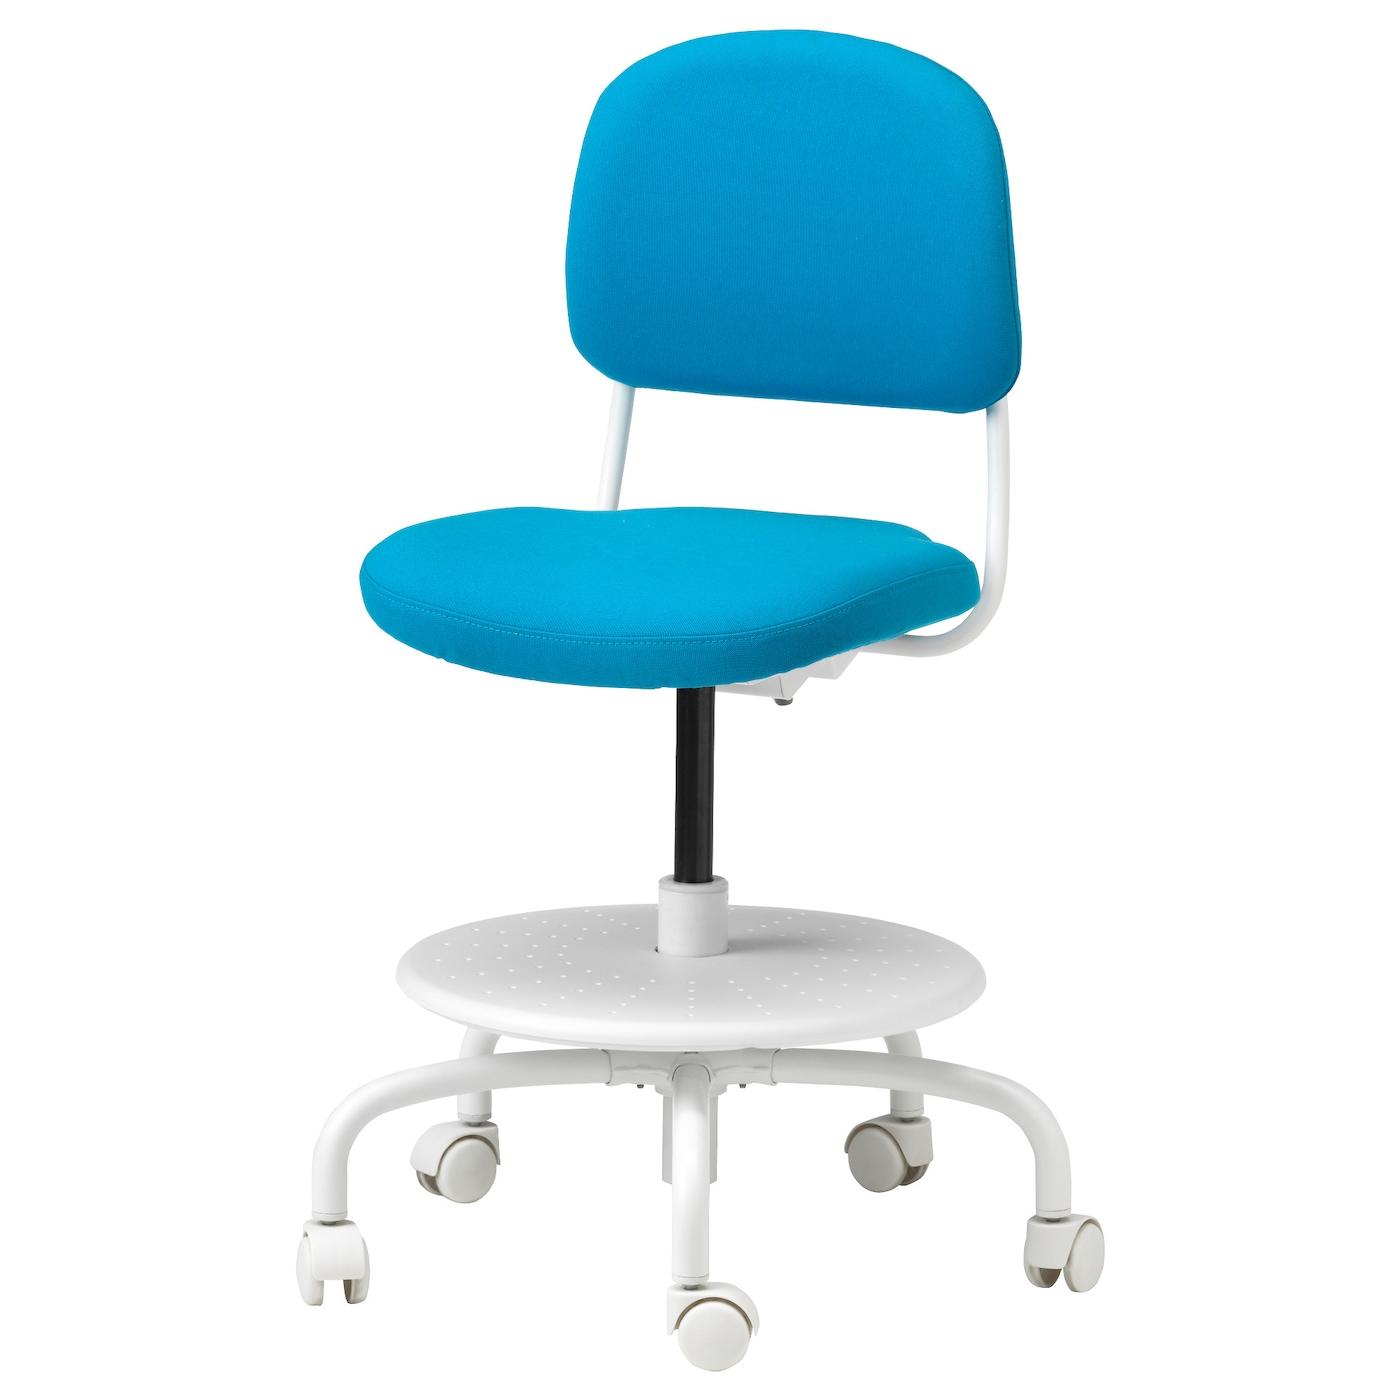 Teal office chair - Ikea Vimund Children S Desk Chair